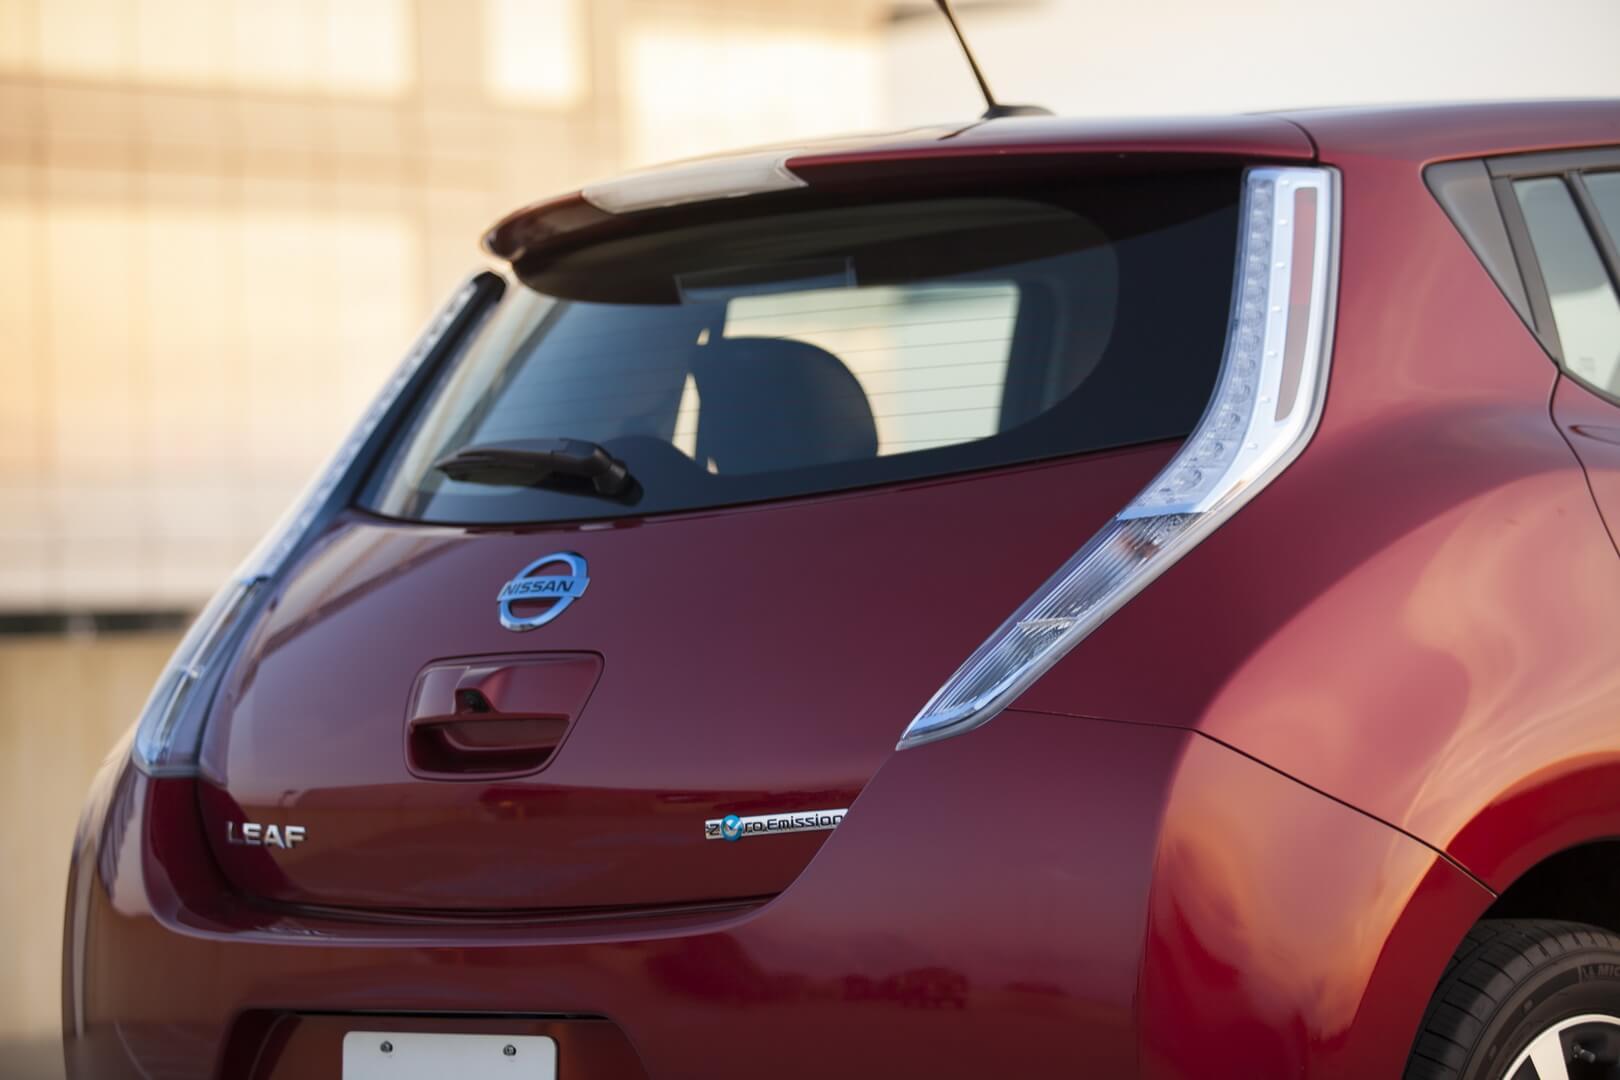 Фотография экоавто Nissan Leaf 2013 (24 кВт•ч) - фото 26